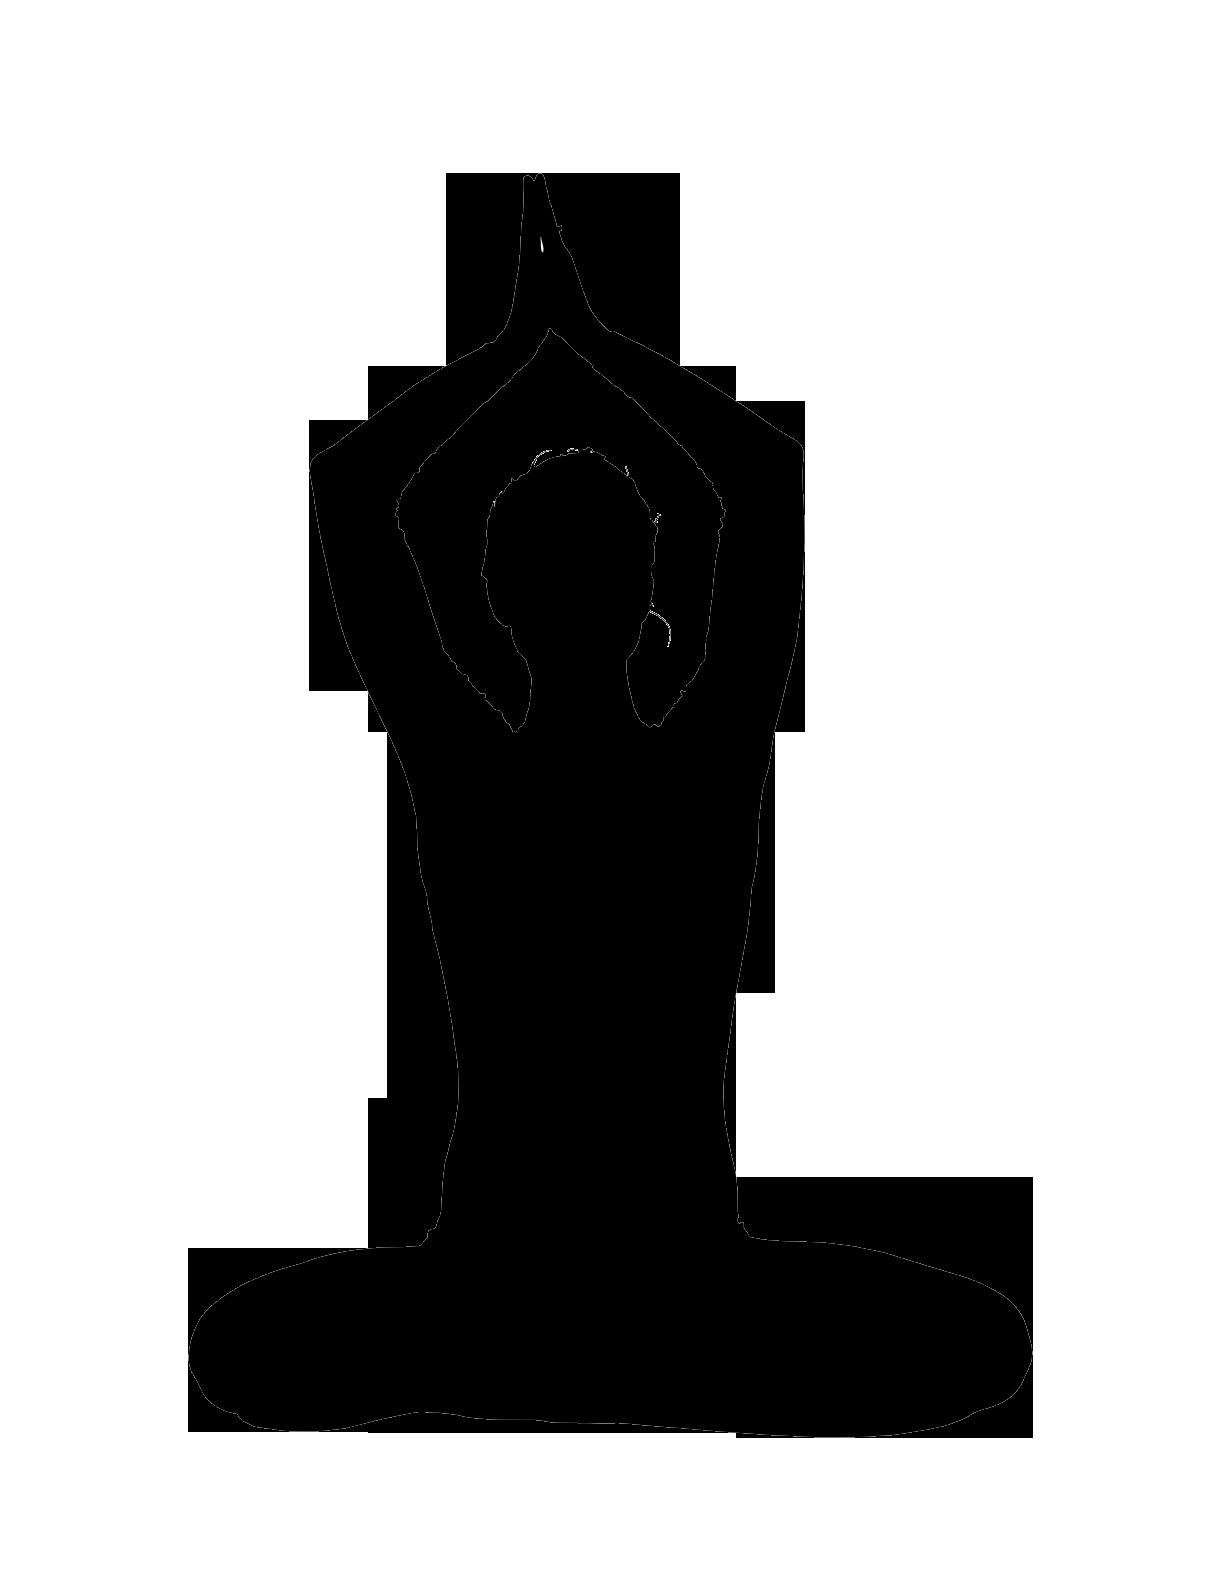 Yoga Silhouette-Yoga Silhouette-14